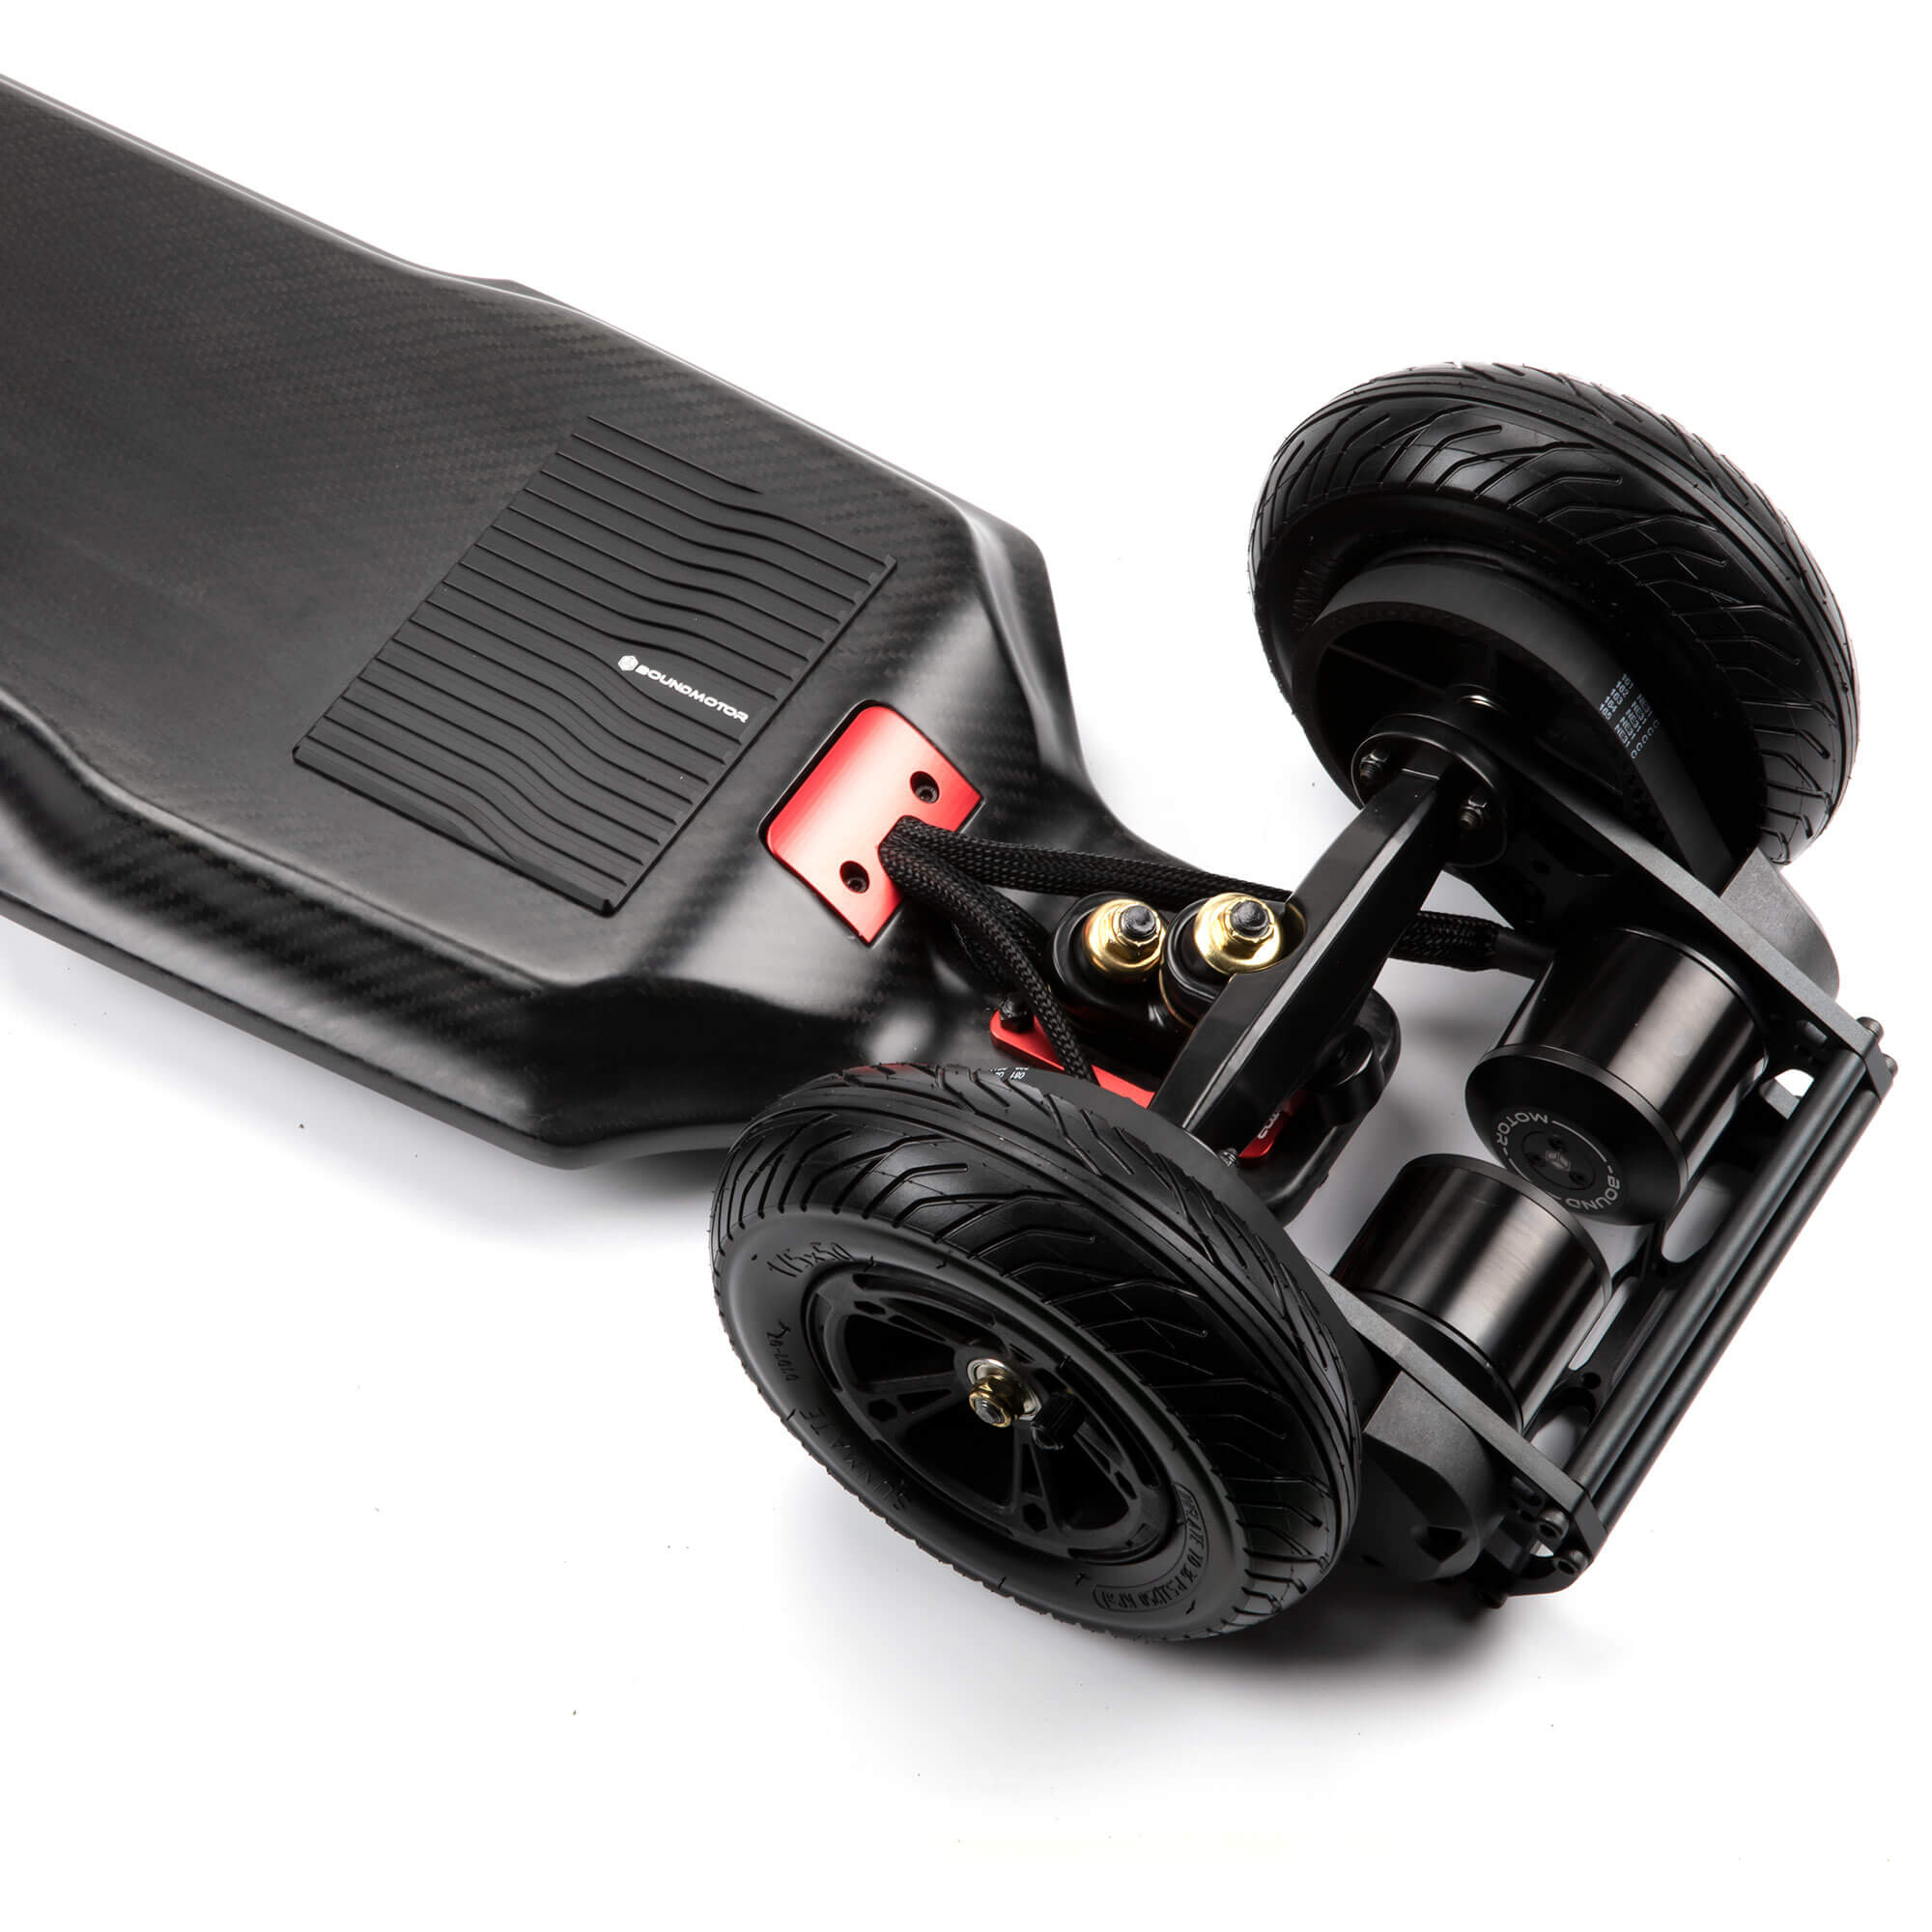 Electric belt drive skateboard - boundmotor FLASH AT